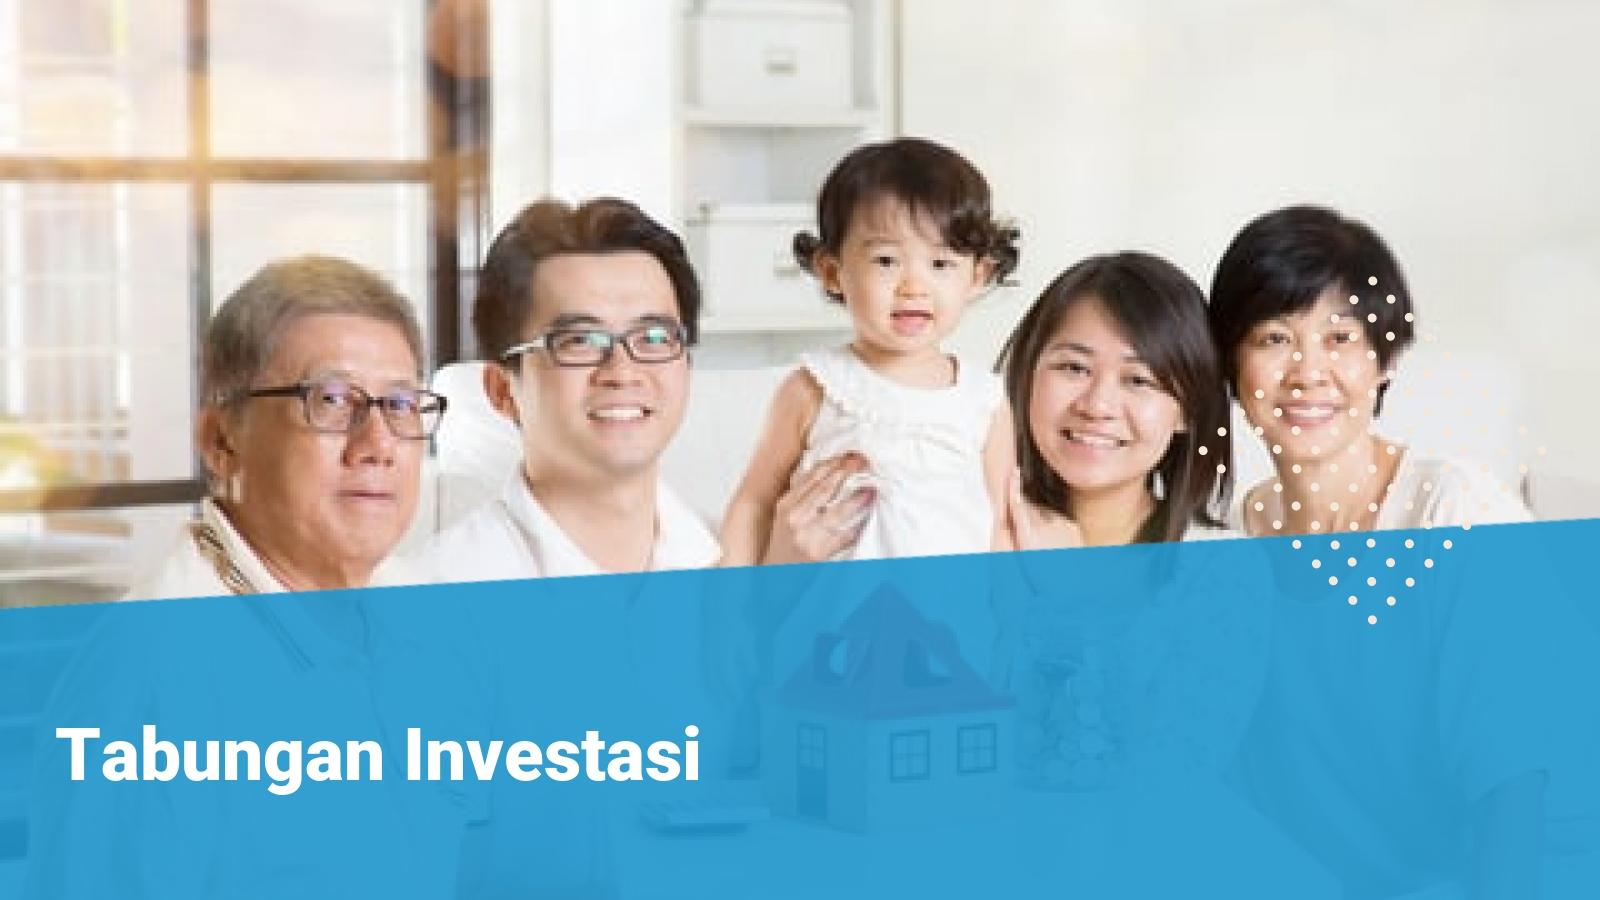 Tabungan Investasi